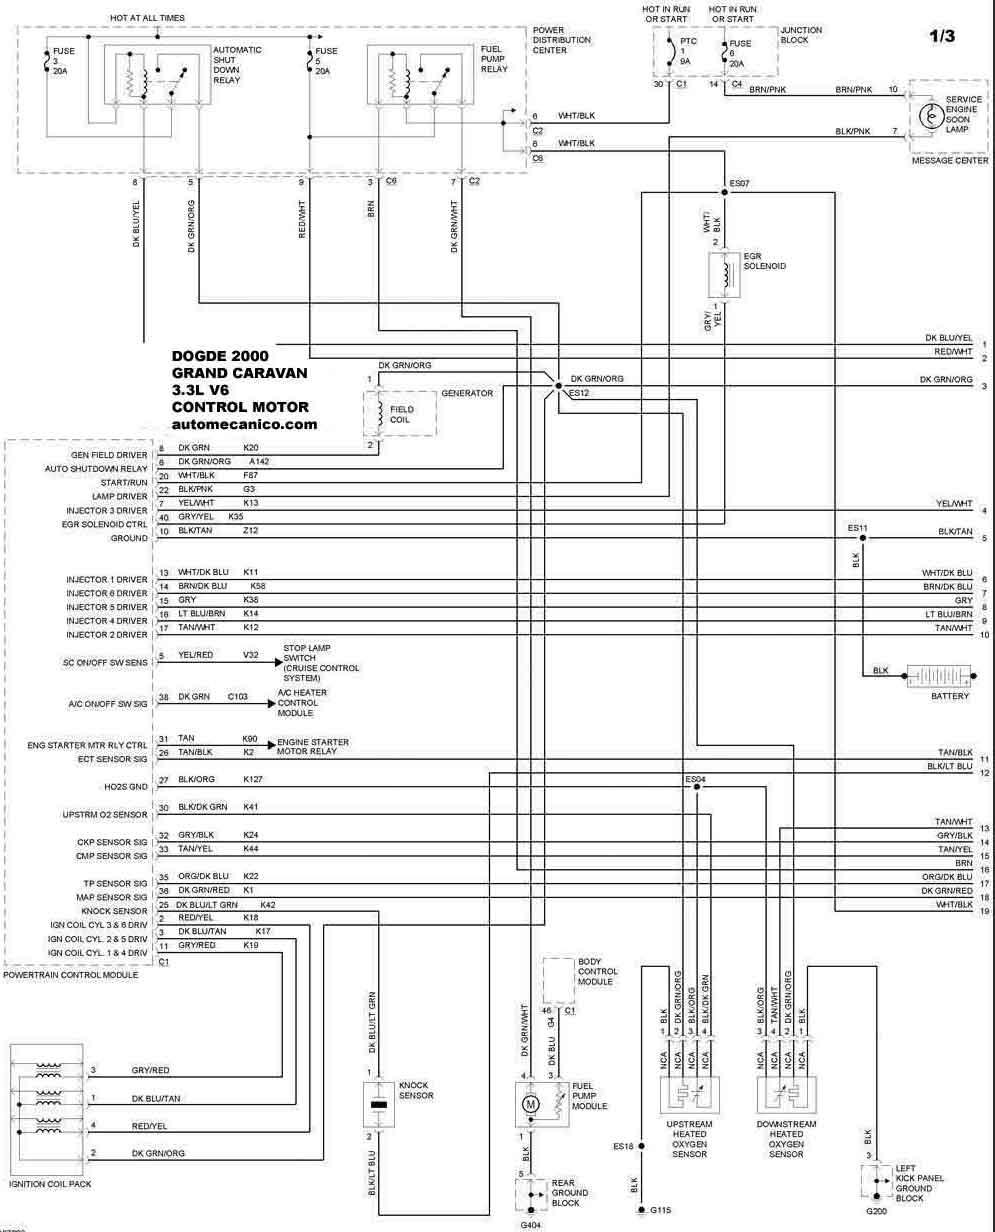 Dodge Dakota Wiring Diagram Dodge 2000 Diagramas Control Del Motor Vehiculos